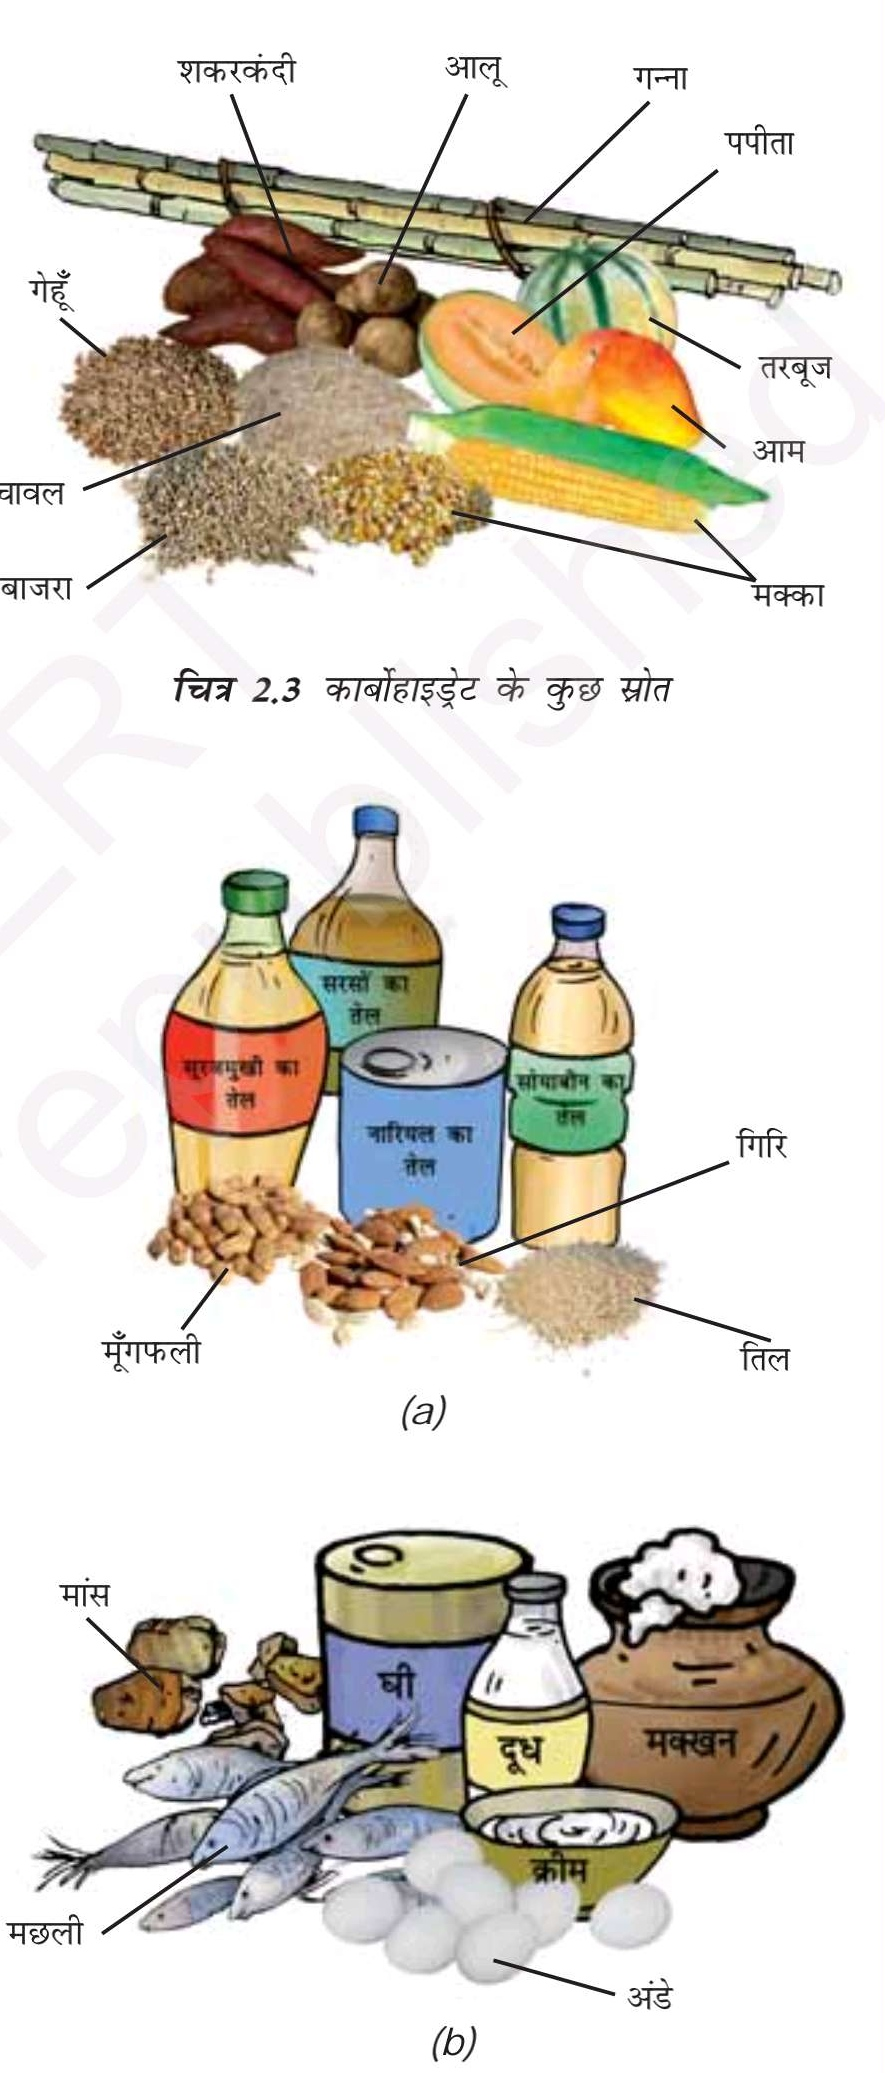 कार्बोहाइड्रेट, वसा और प्रोटीन - Carbohydrates, Fats and Proteins